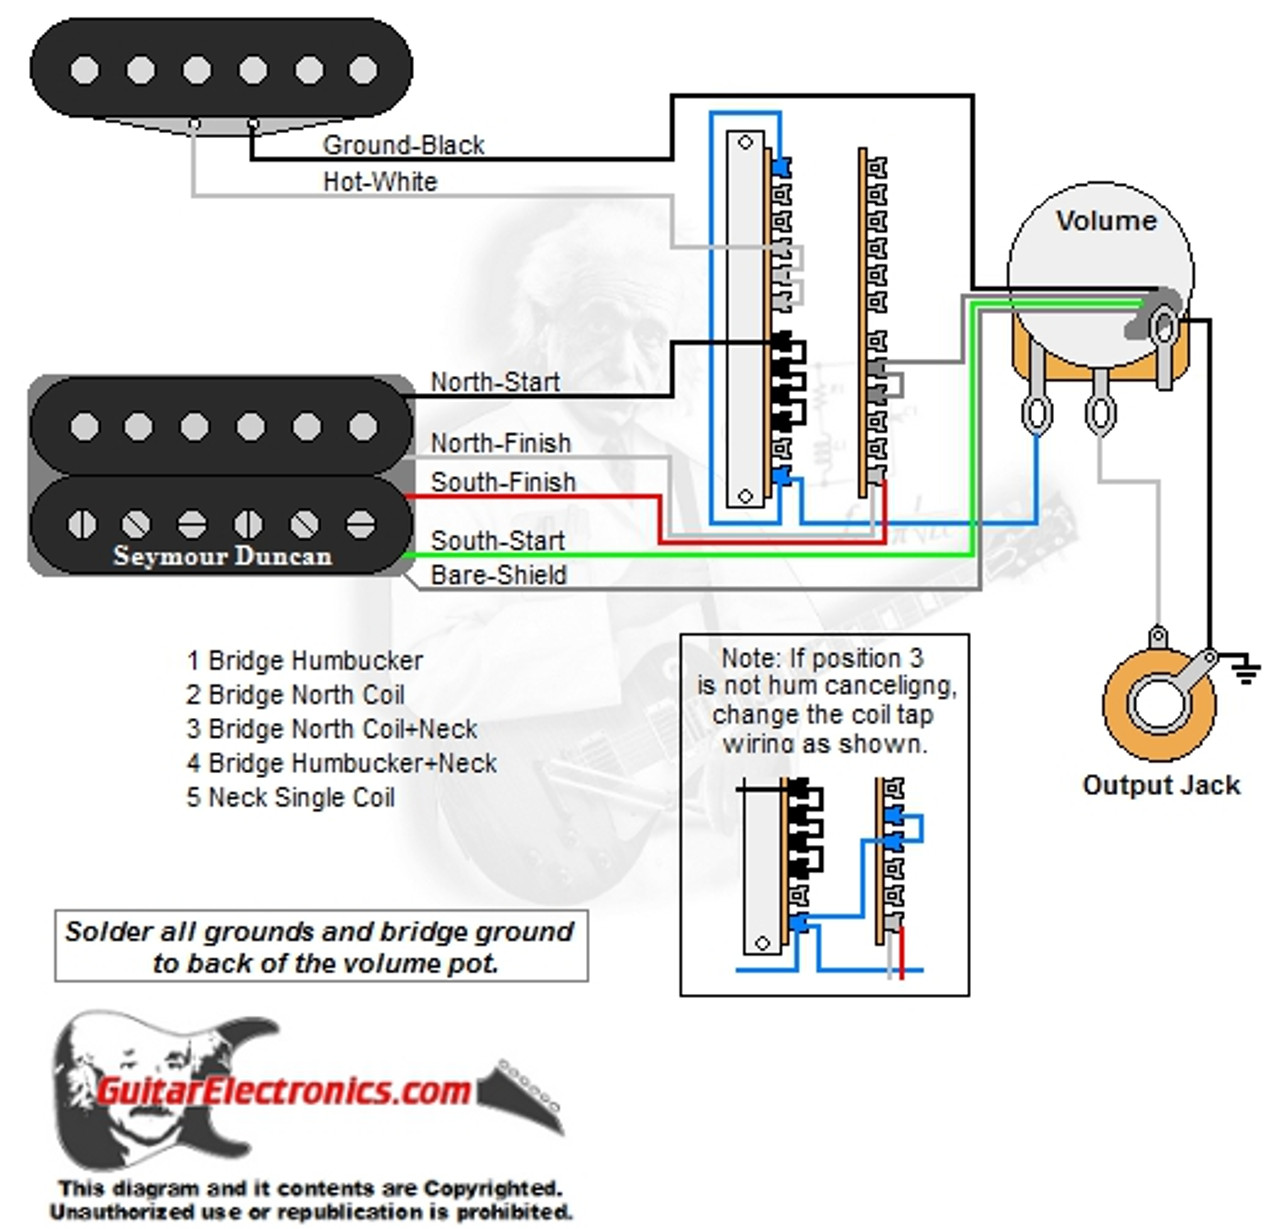 1 humbucker 1 single coil 5 way lever switch 1 volume 01 wiring diagram for bridge humbucker single coil in neck telecaster [ 1280 x 1229 Pixel ]